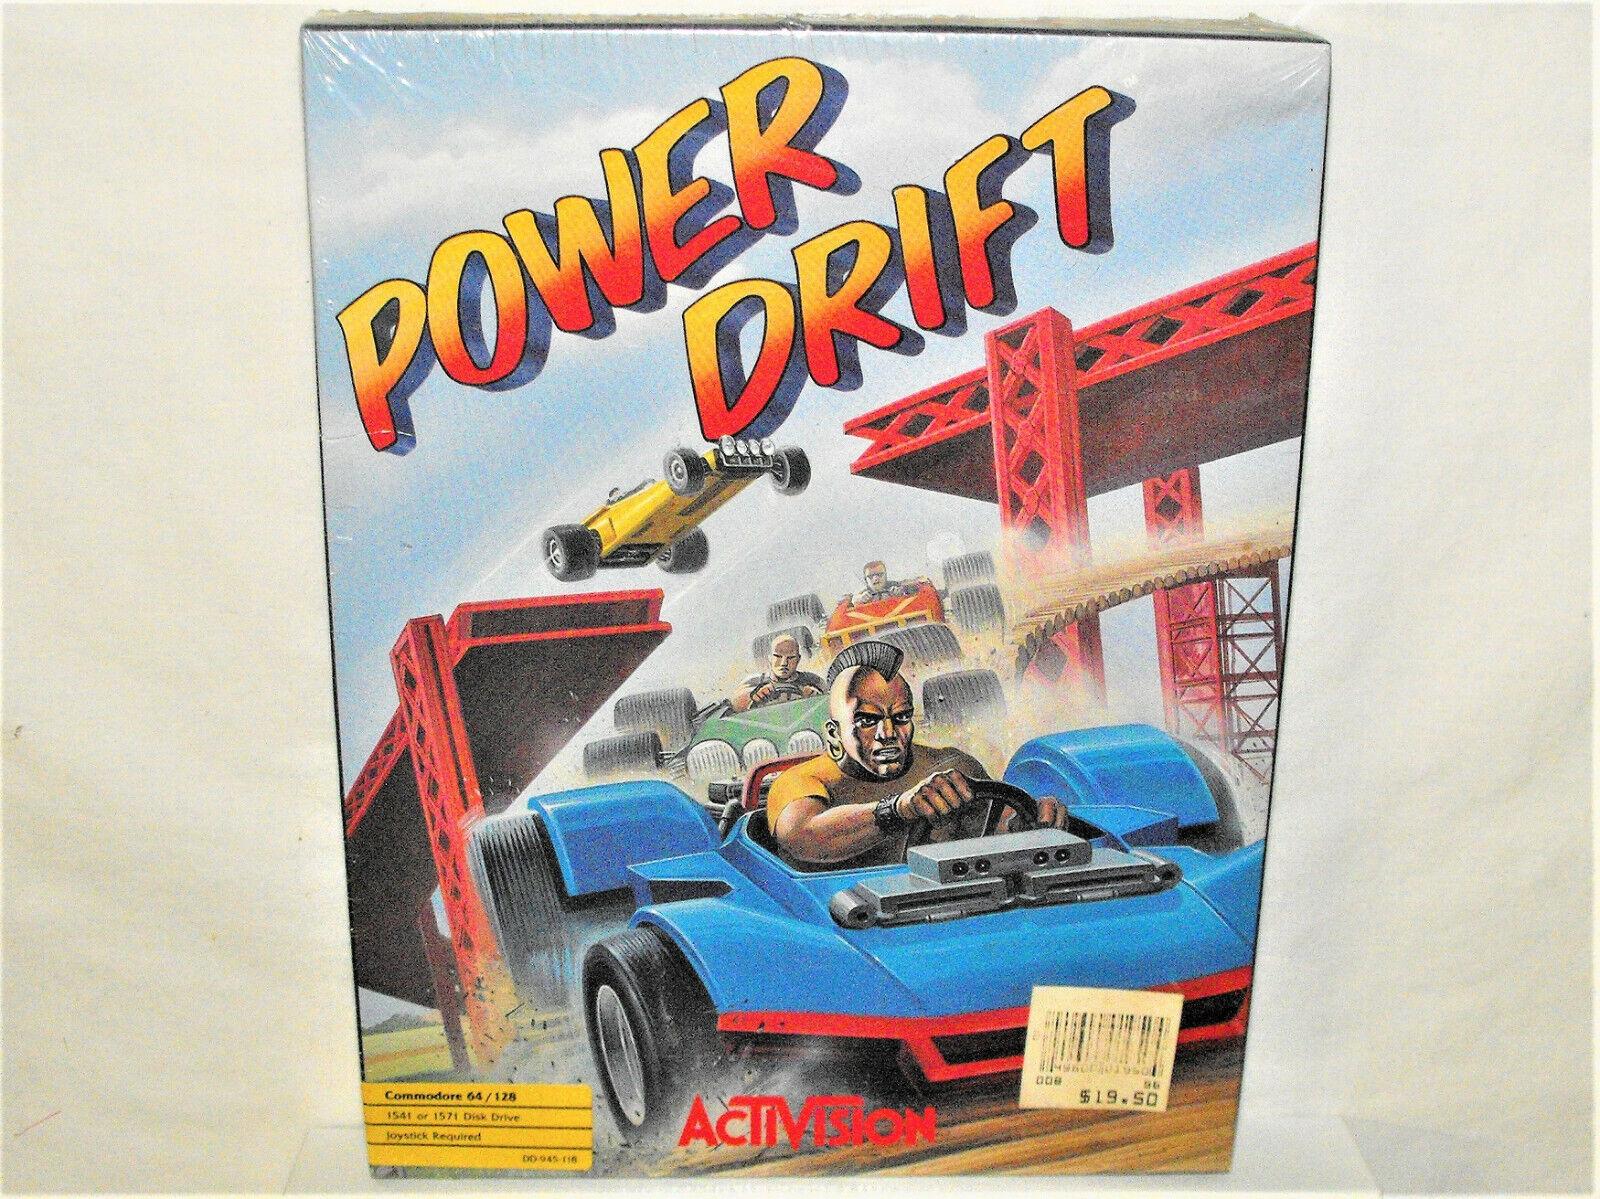 Computer Games - Commodore 64/128 PC Computer Game POWER DRIFT Activision SEGA Racing Sealed Box